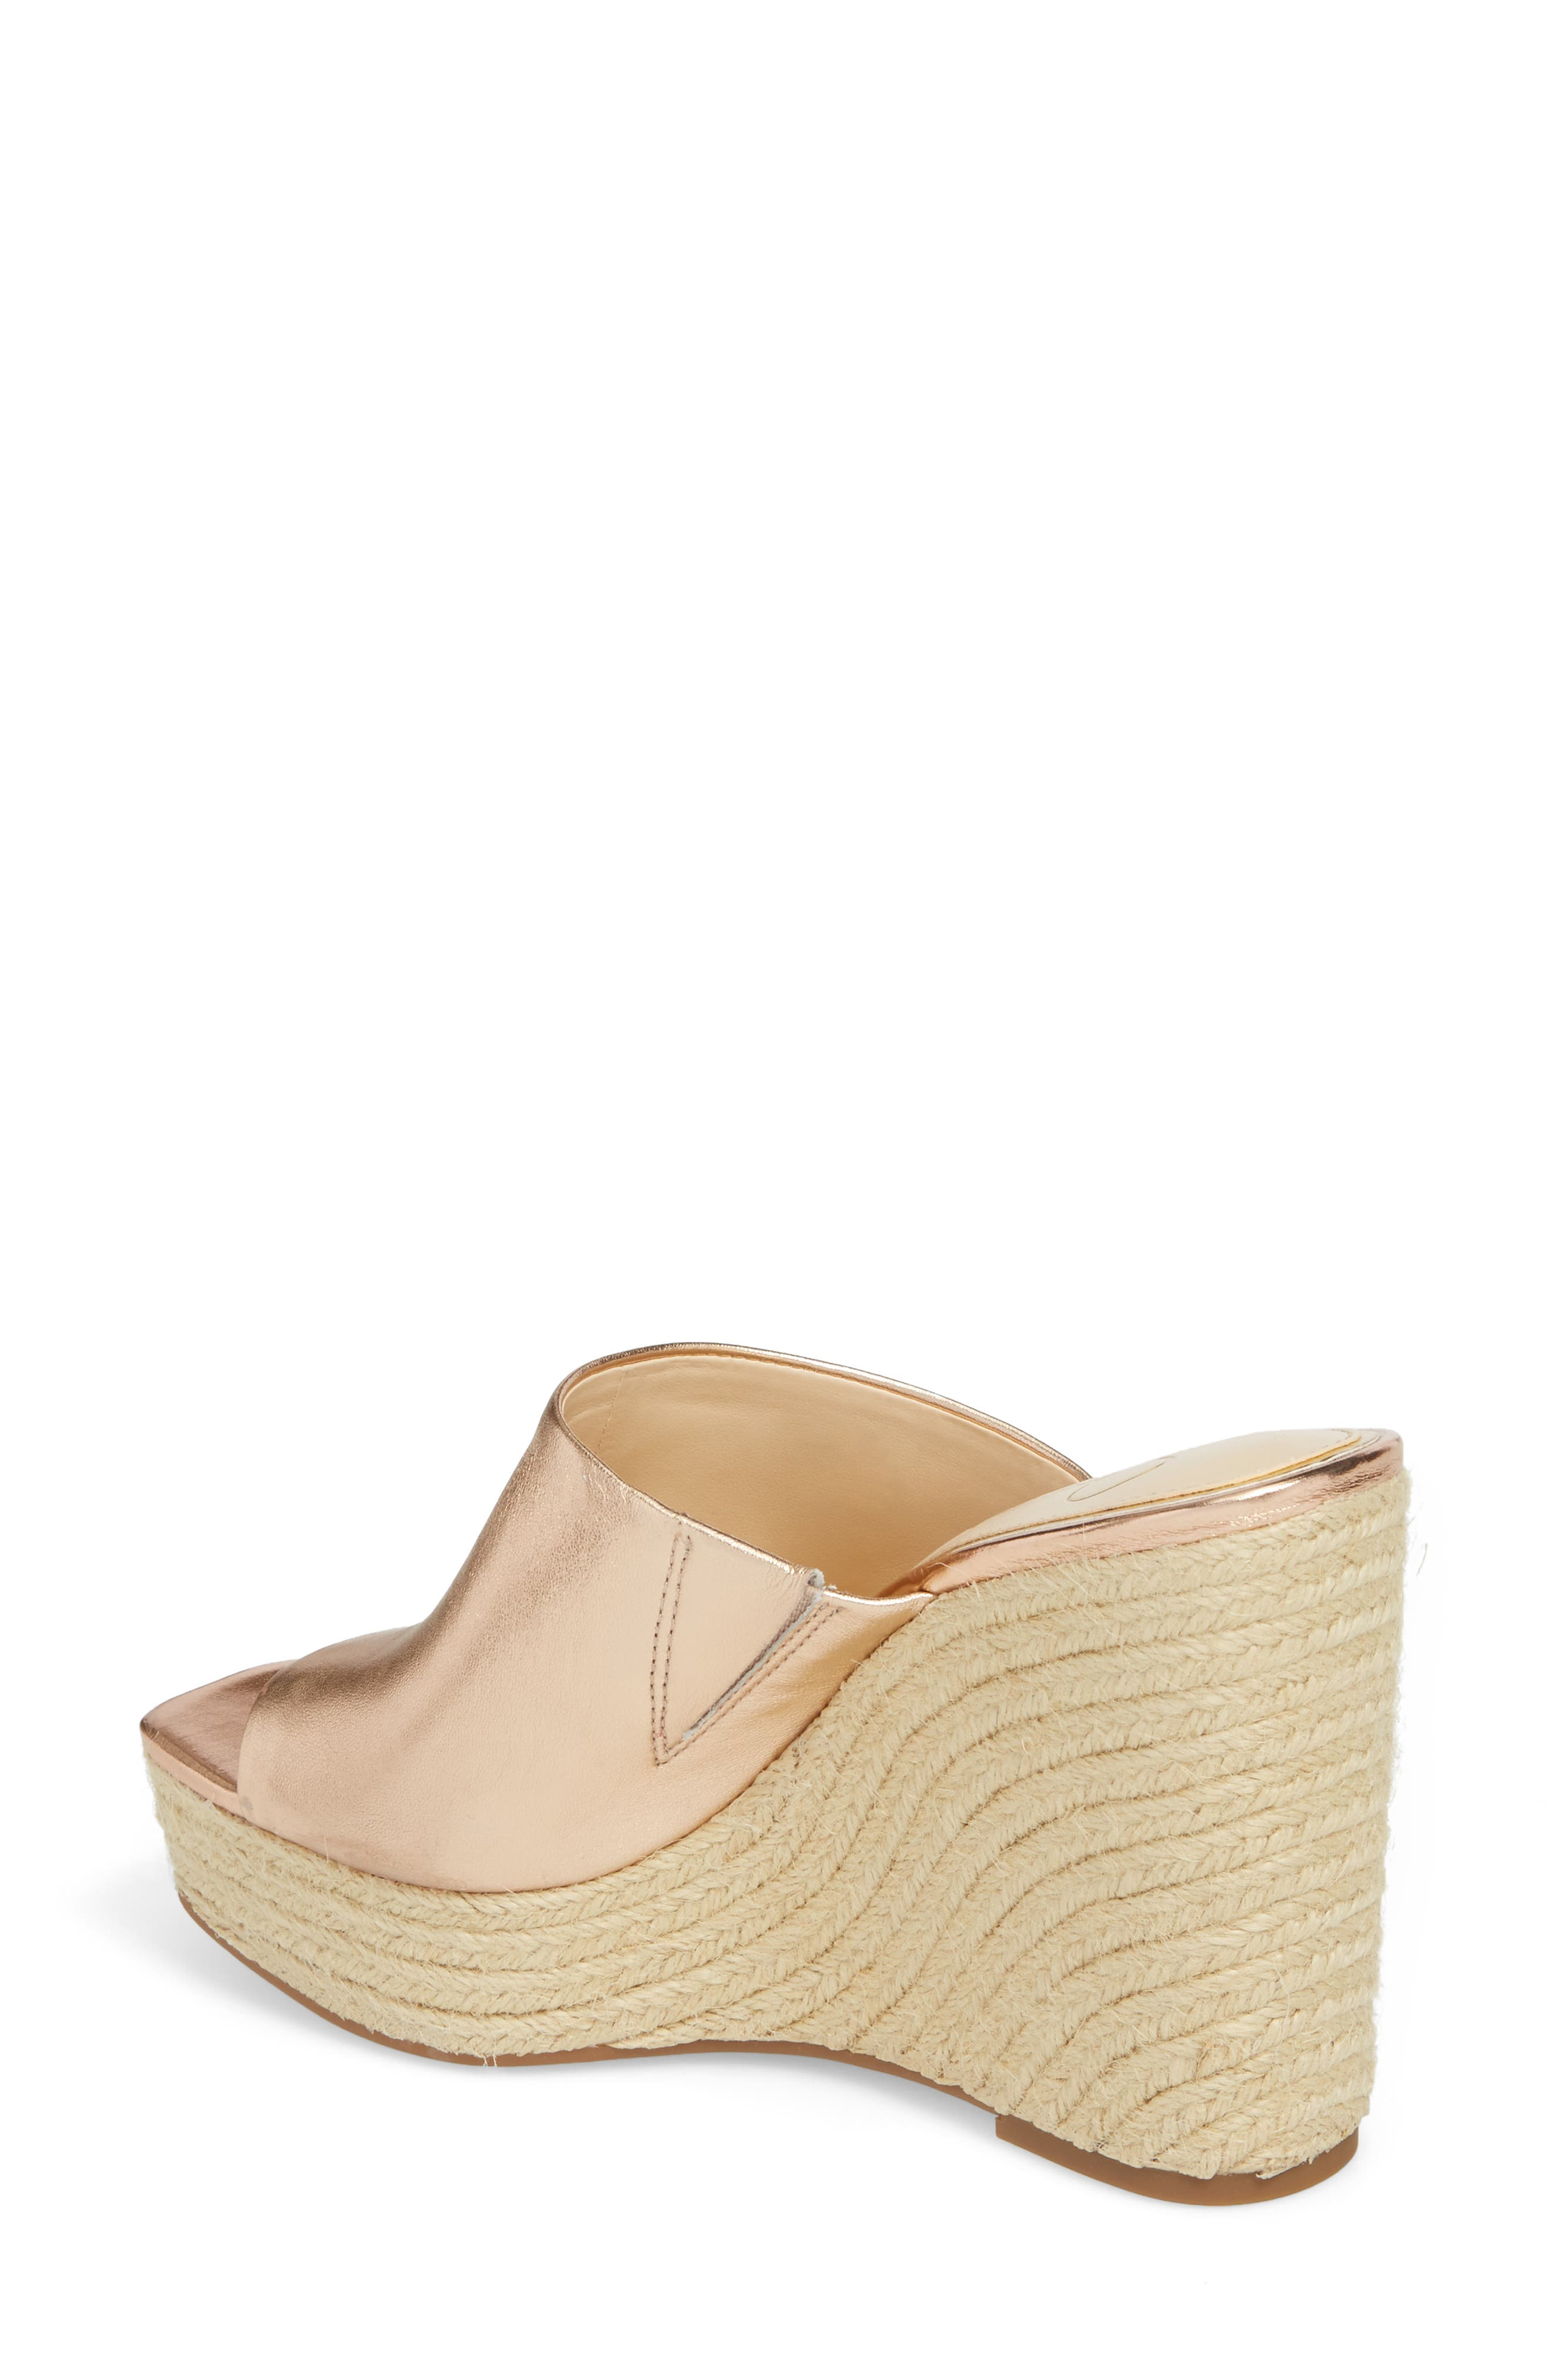 Sirella Platform Wedge Slide Sandal,                             Alternate thumbnail 6, color,